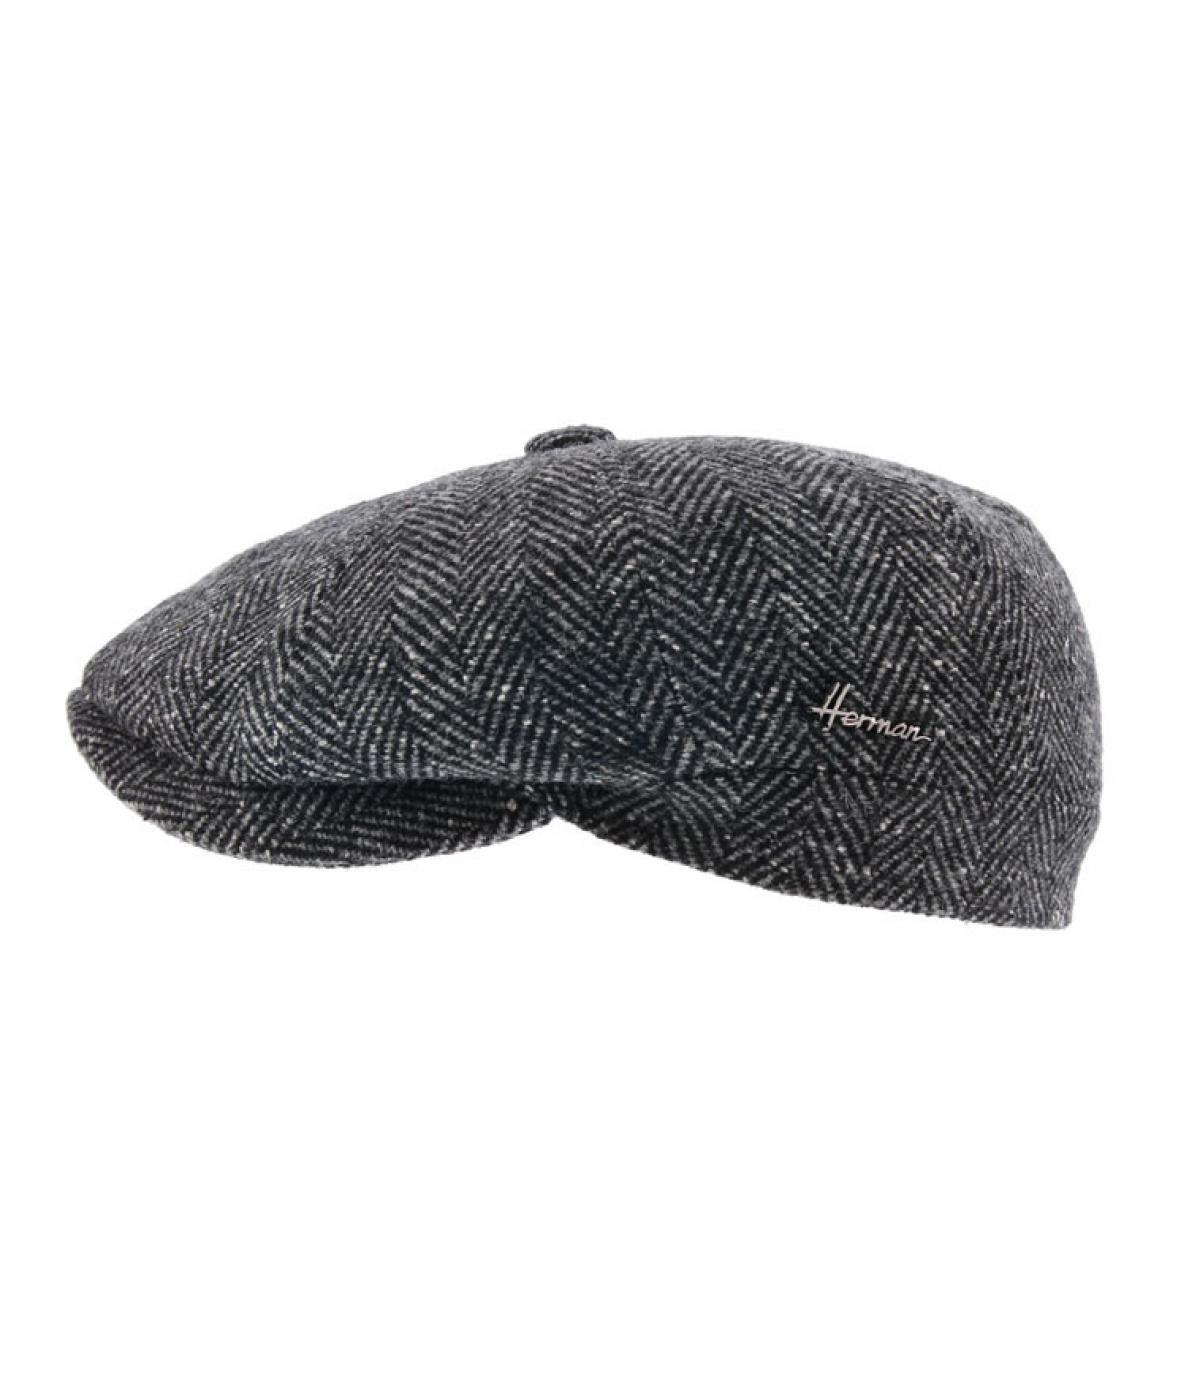 Details Advancer Wool black - Abbildung 2